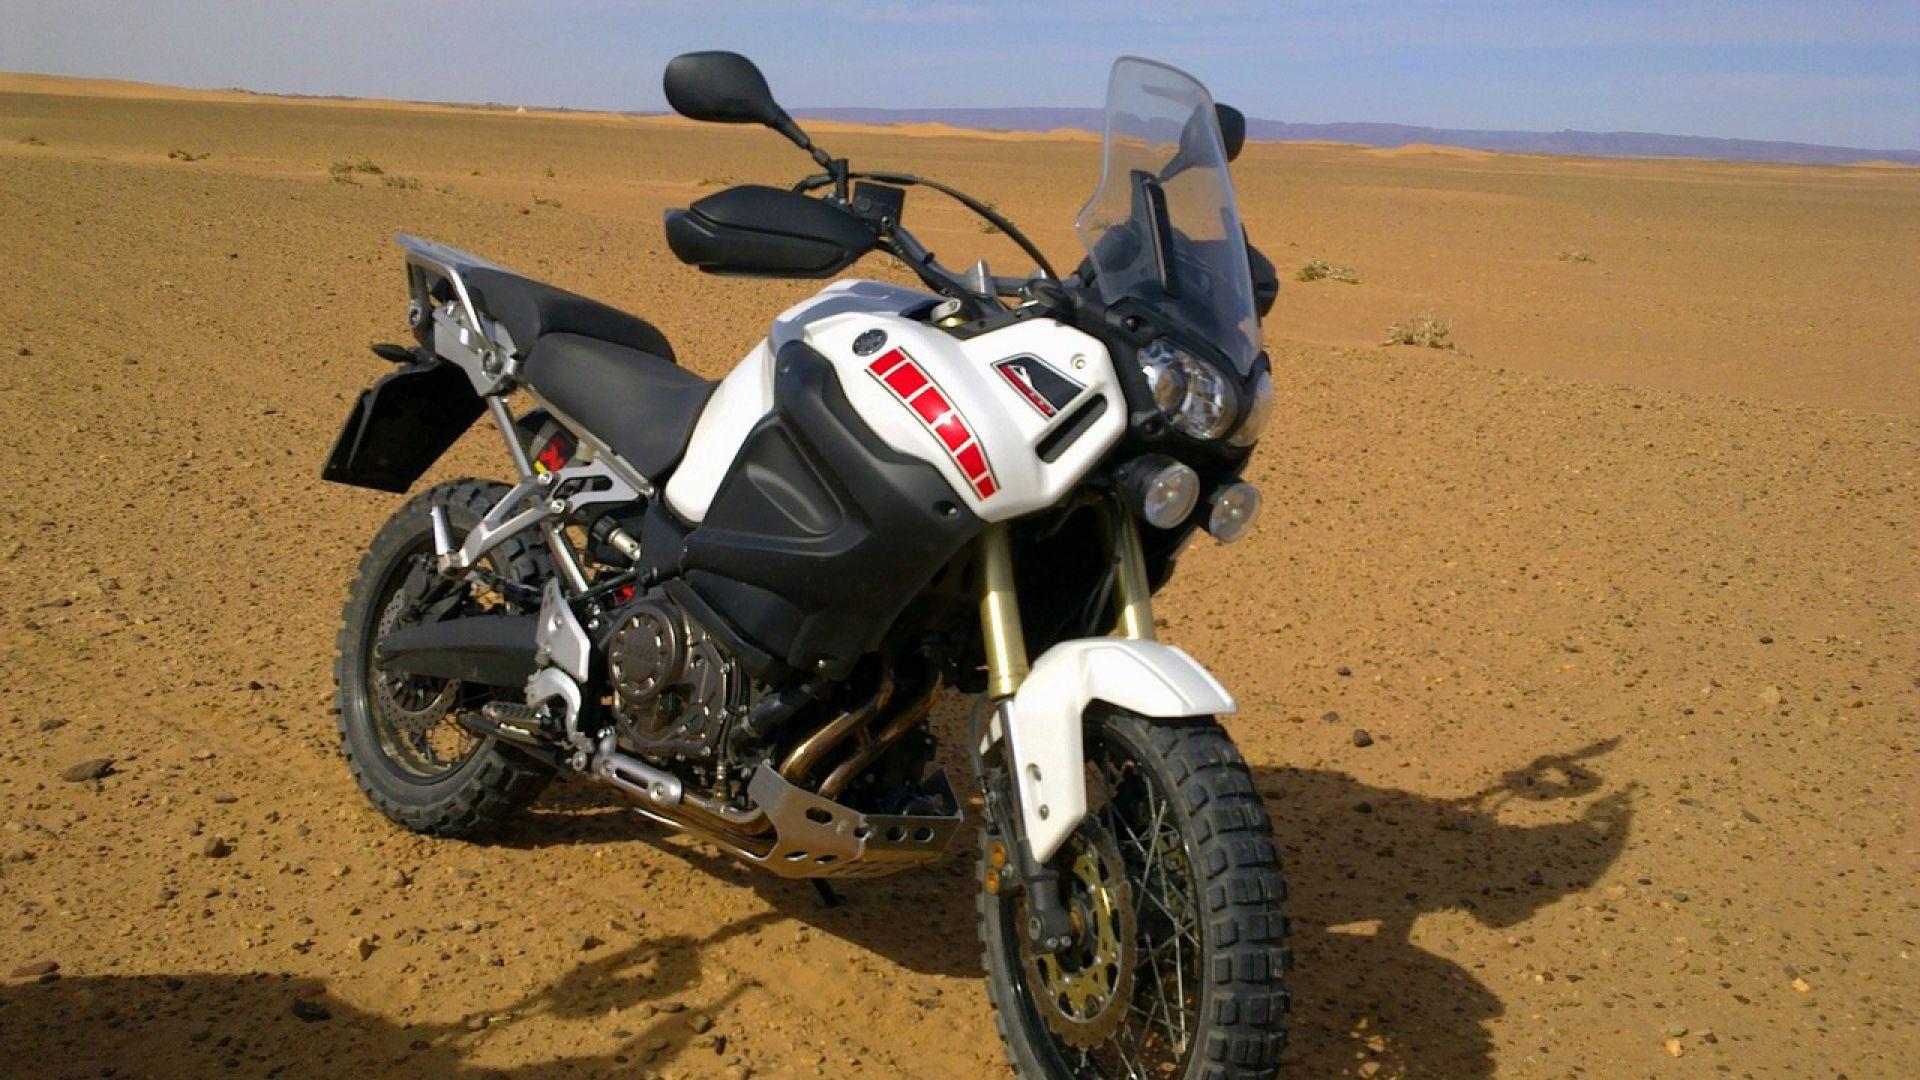 Immagine 112: In Marocco con la Yamaha Super Ténéré